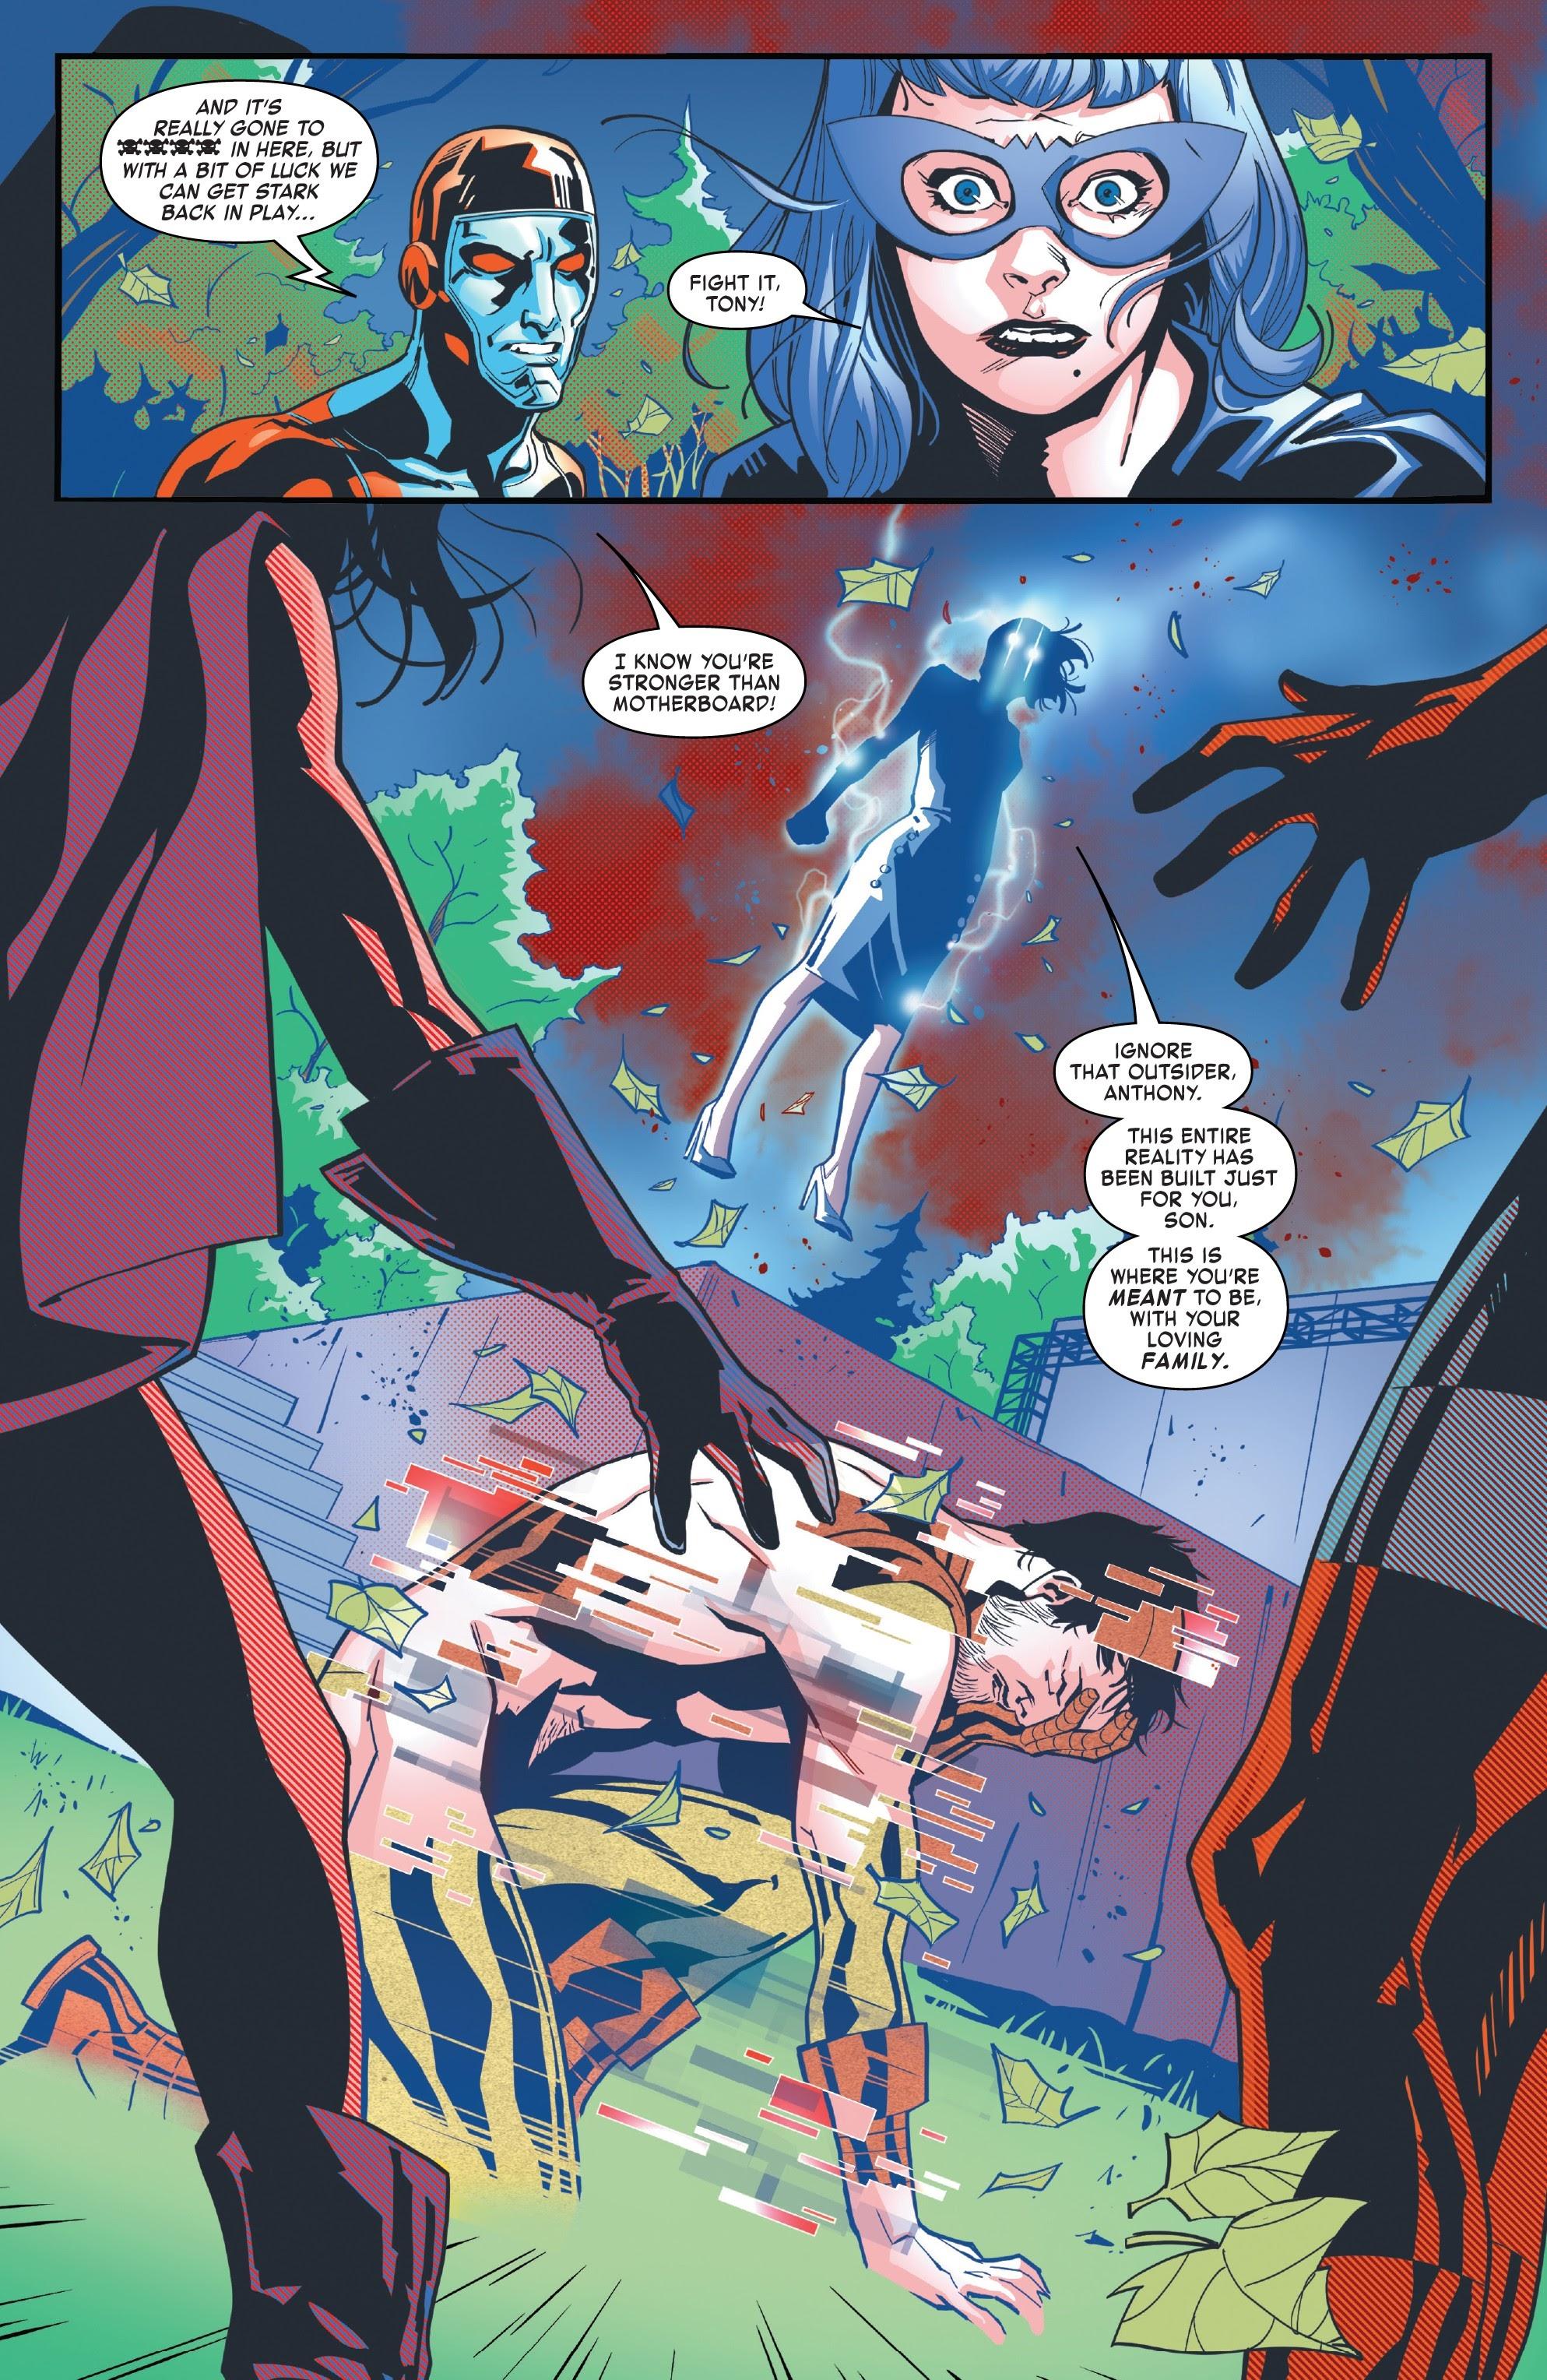 Read online Tony Stark: Iron Man comic -  Issue #10 - 6